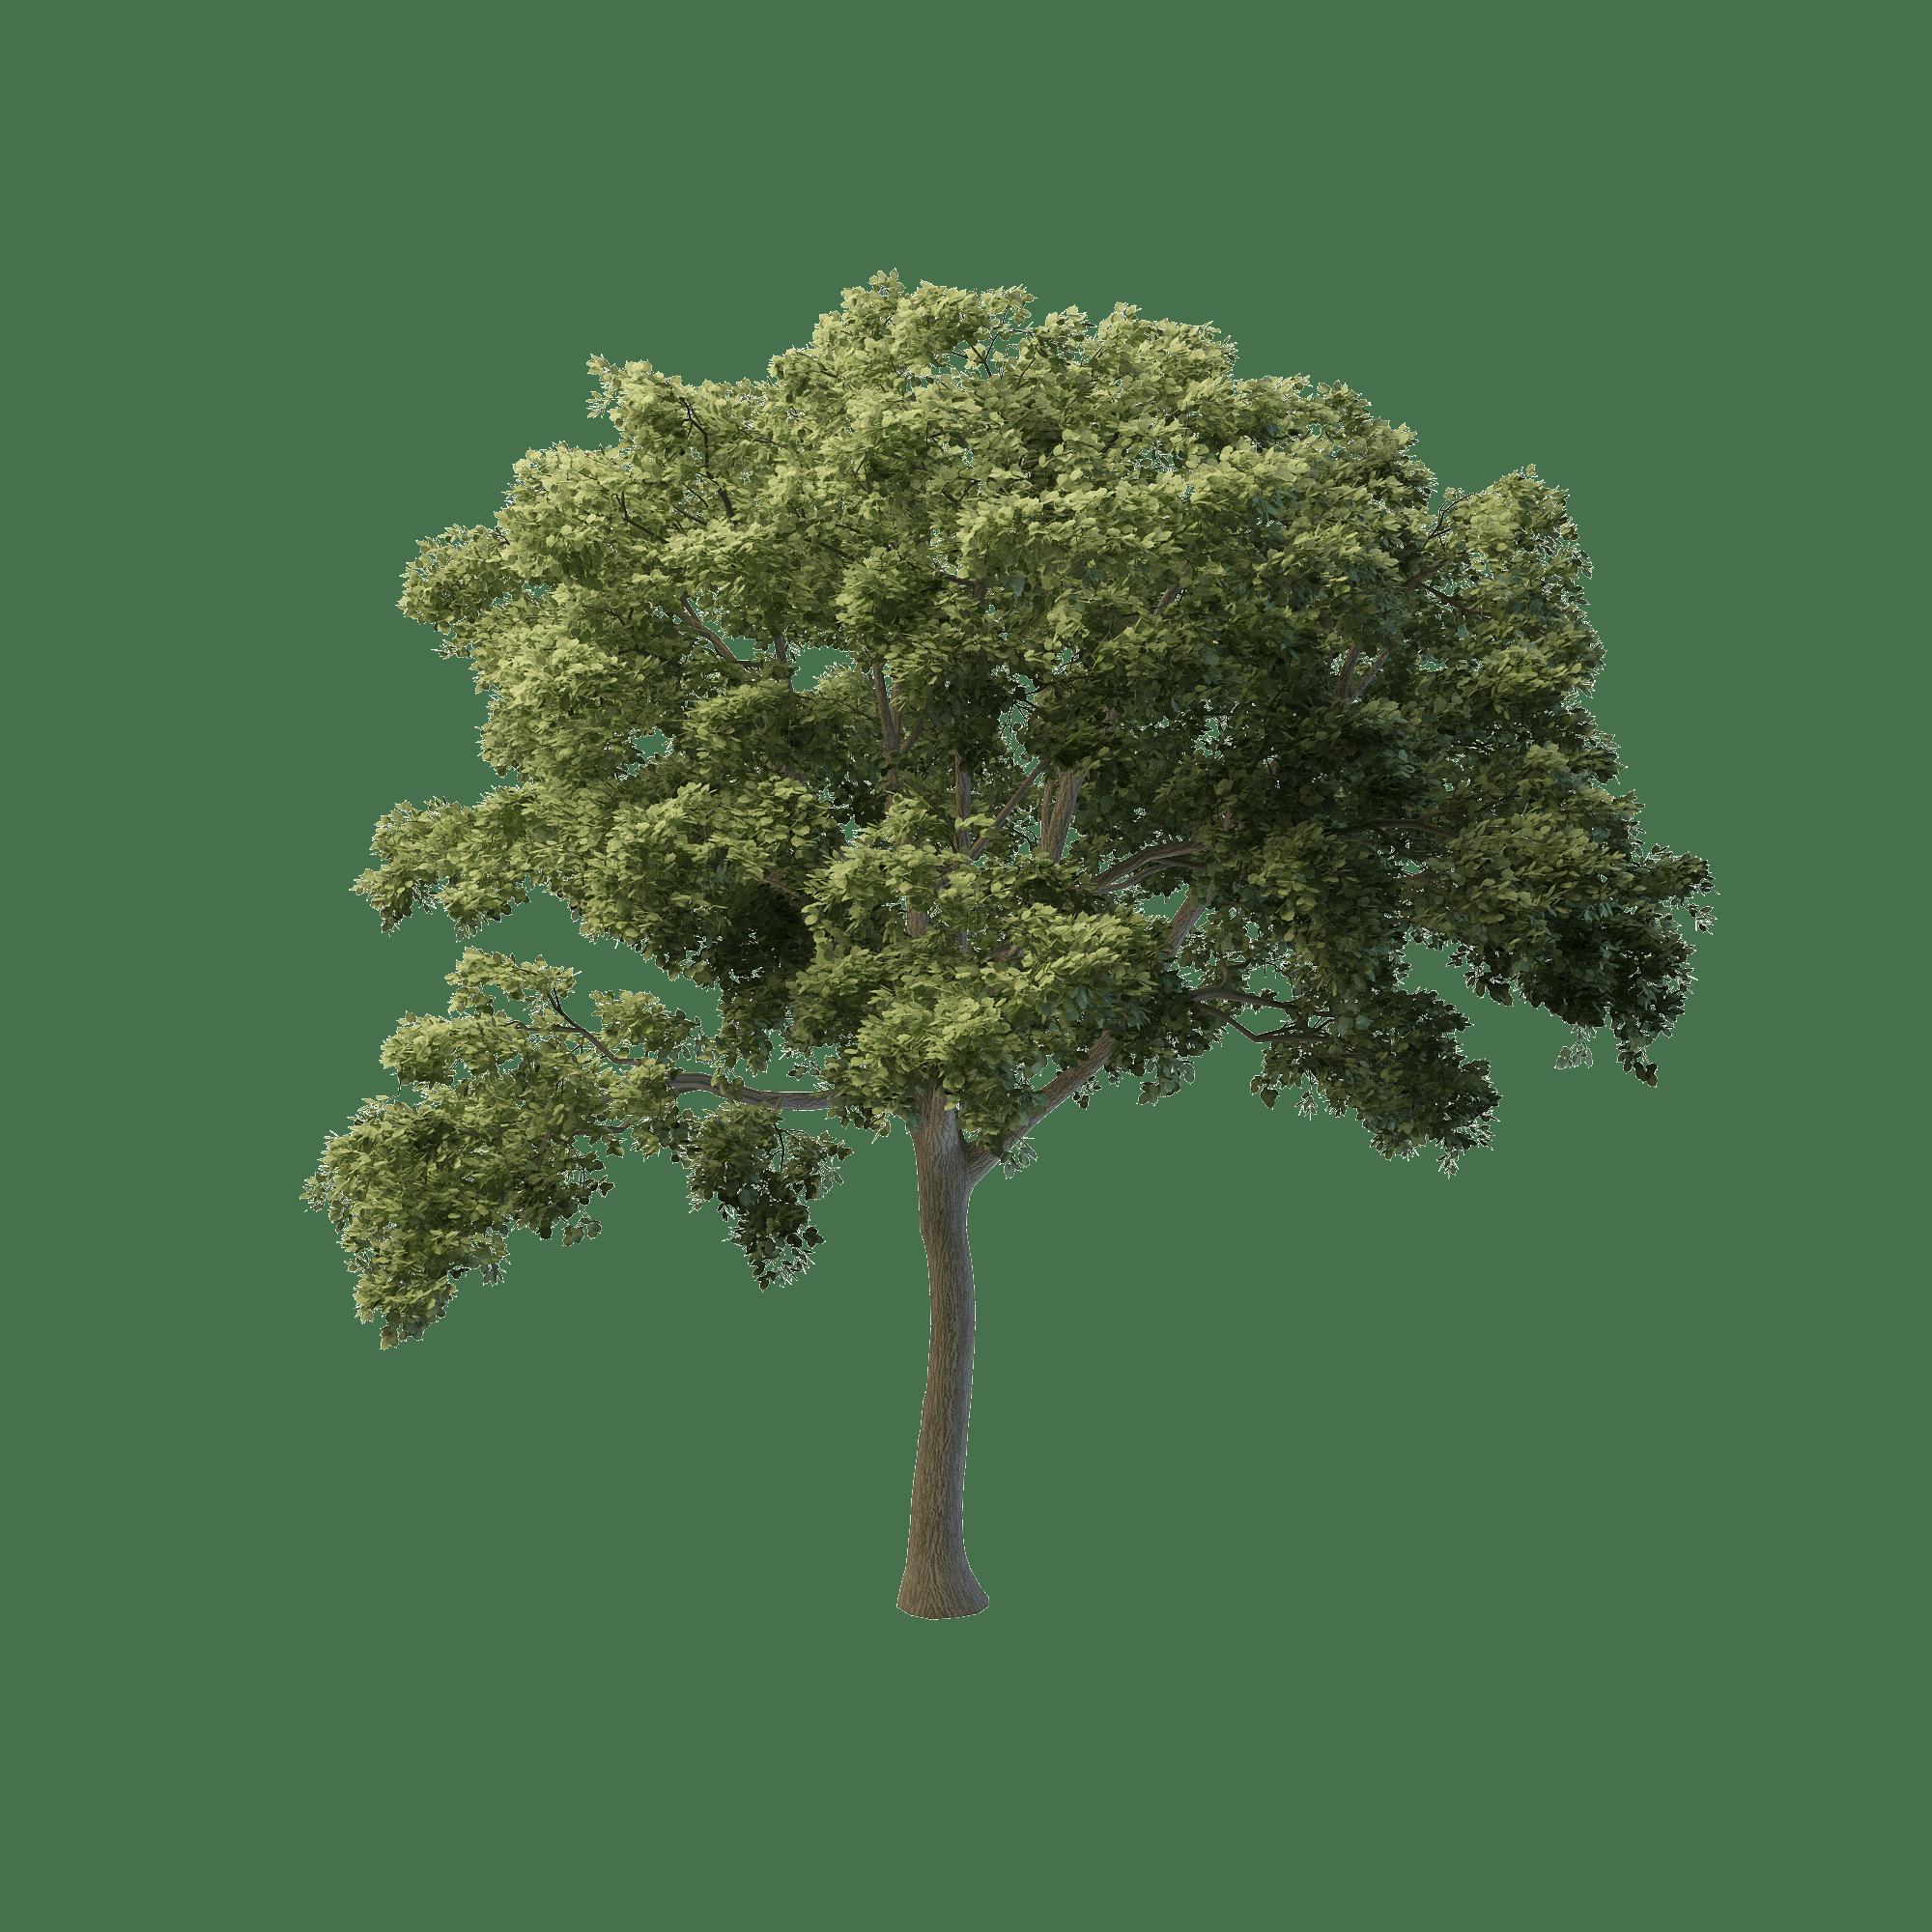 pemodelan 3d kustom pohon resnya